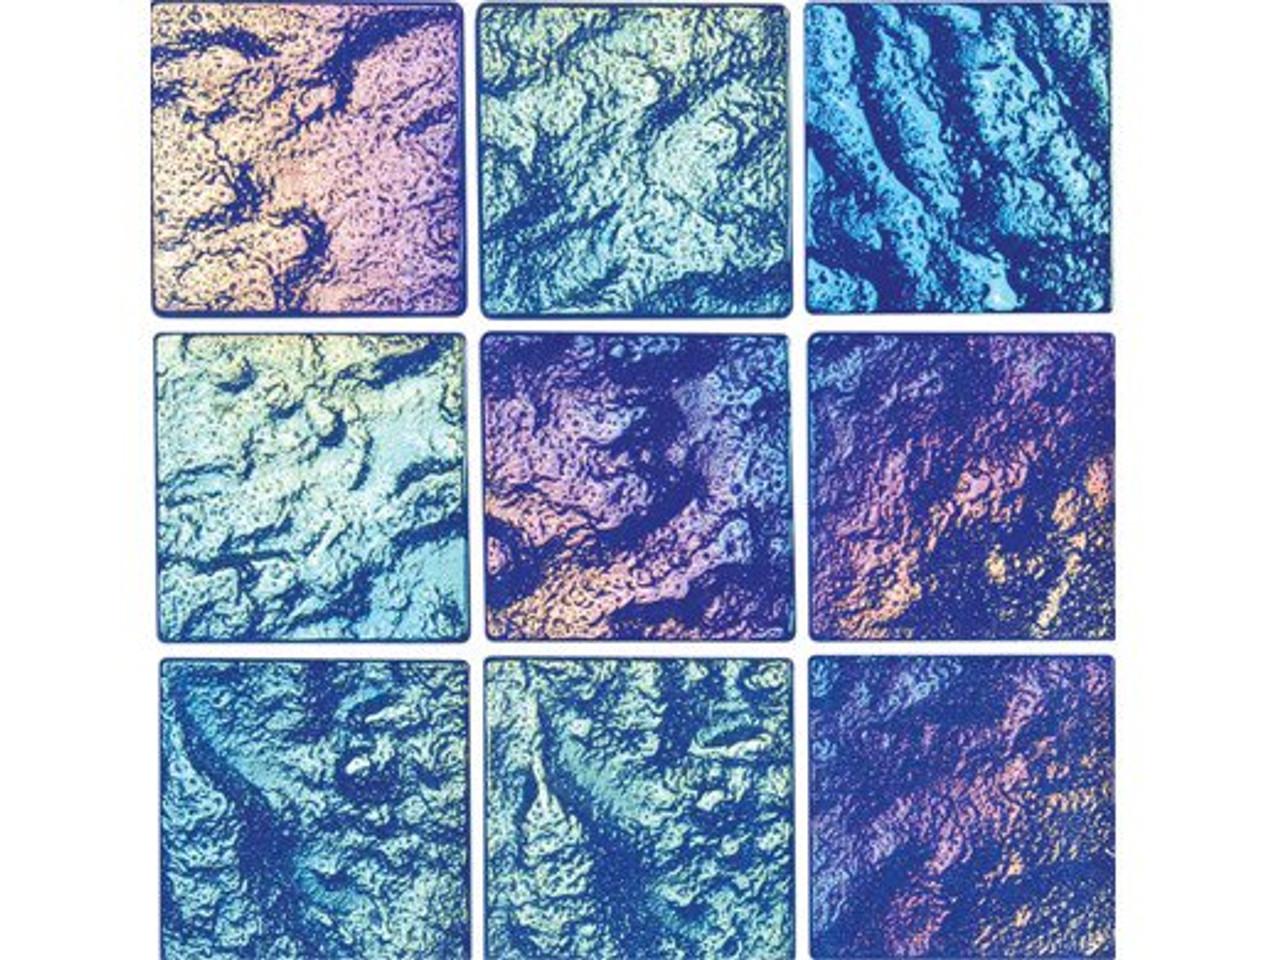 national pool tile lightwaves glass tile blue 2x2 lwv blue2x2